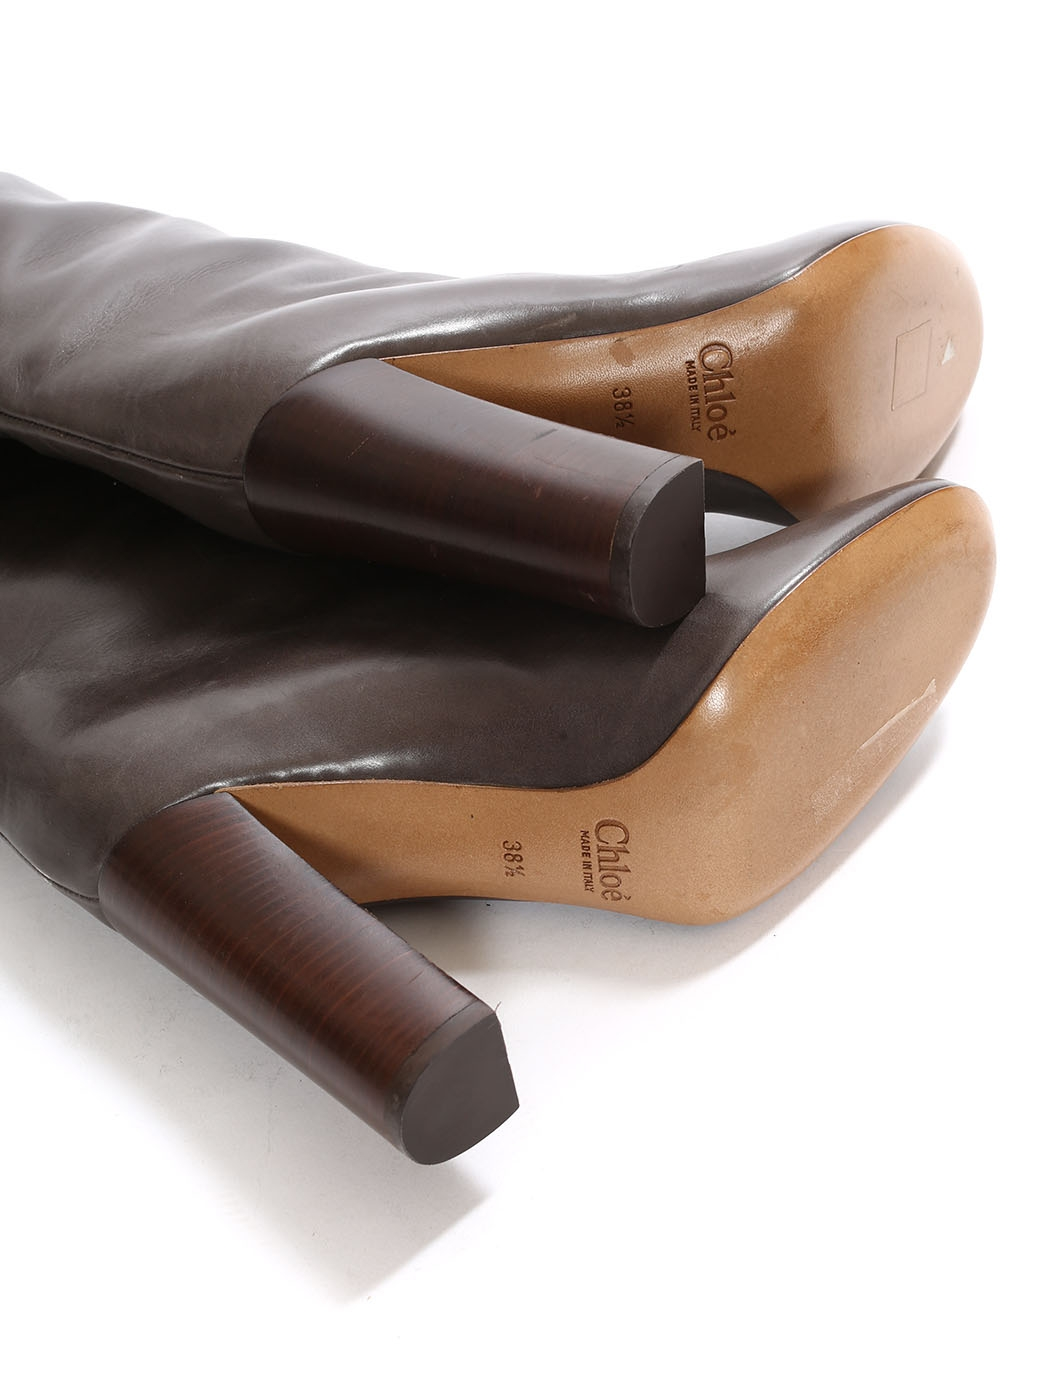 Louise Dark Leather Brown Chloe 6fvhhwq17 Wooden Retail Heel Paris Boots otrsCxhBQd